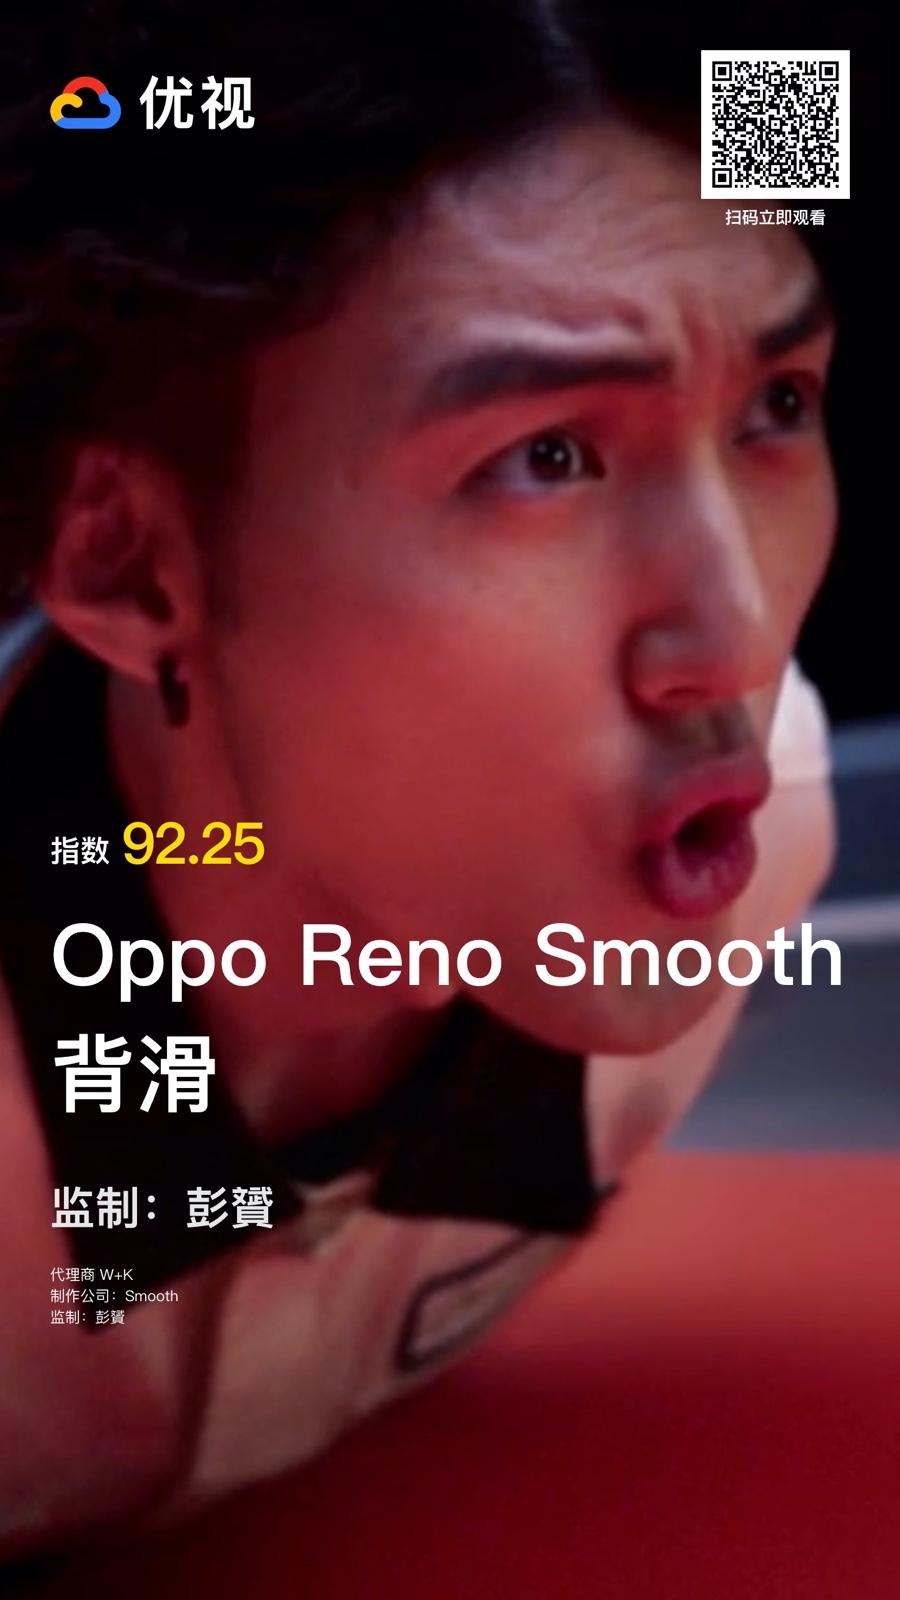 Oppo Reno Smooth 背滑.jpg